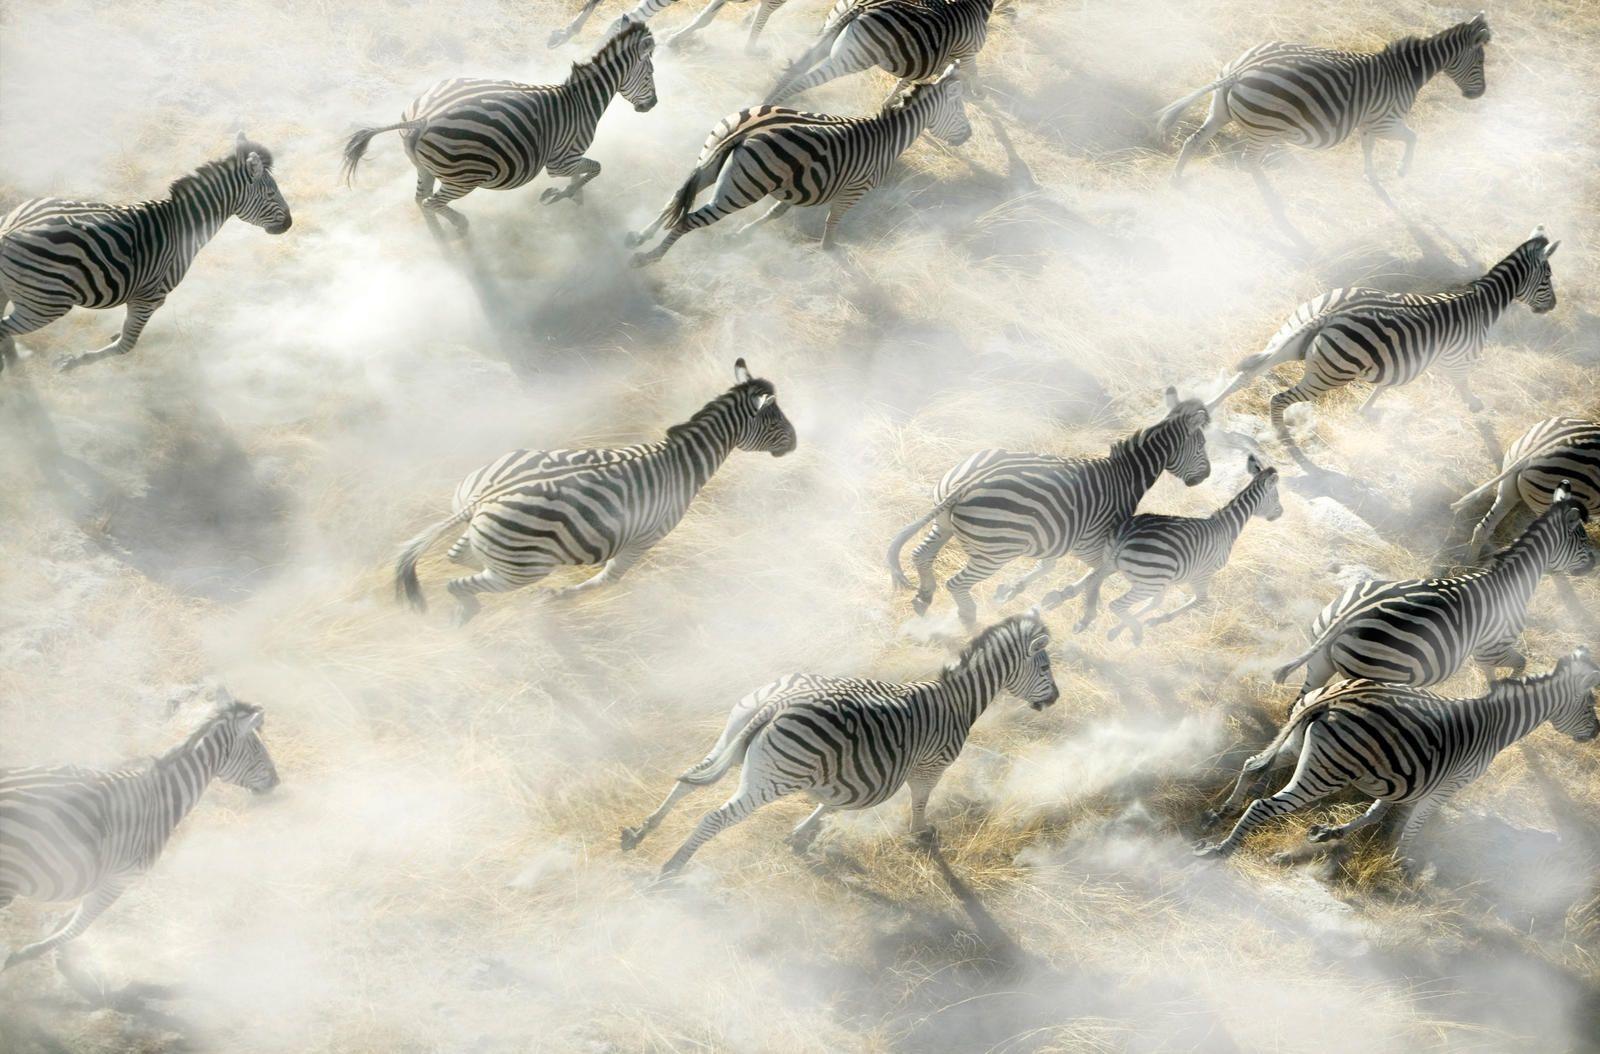 Zebras on the Move [1600  1054] - http://ift.tt/2hT7XXZ